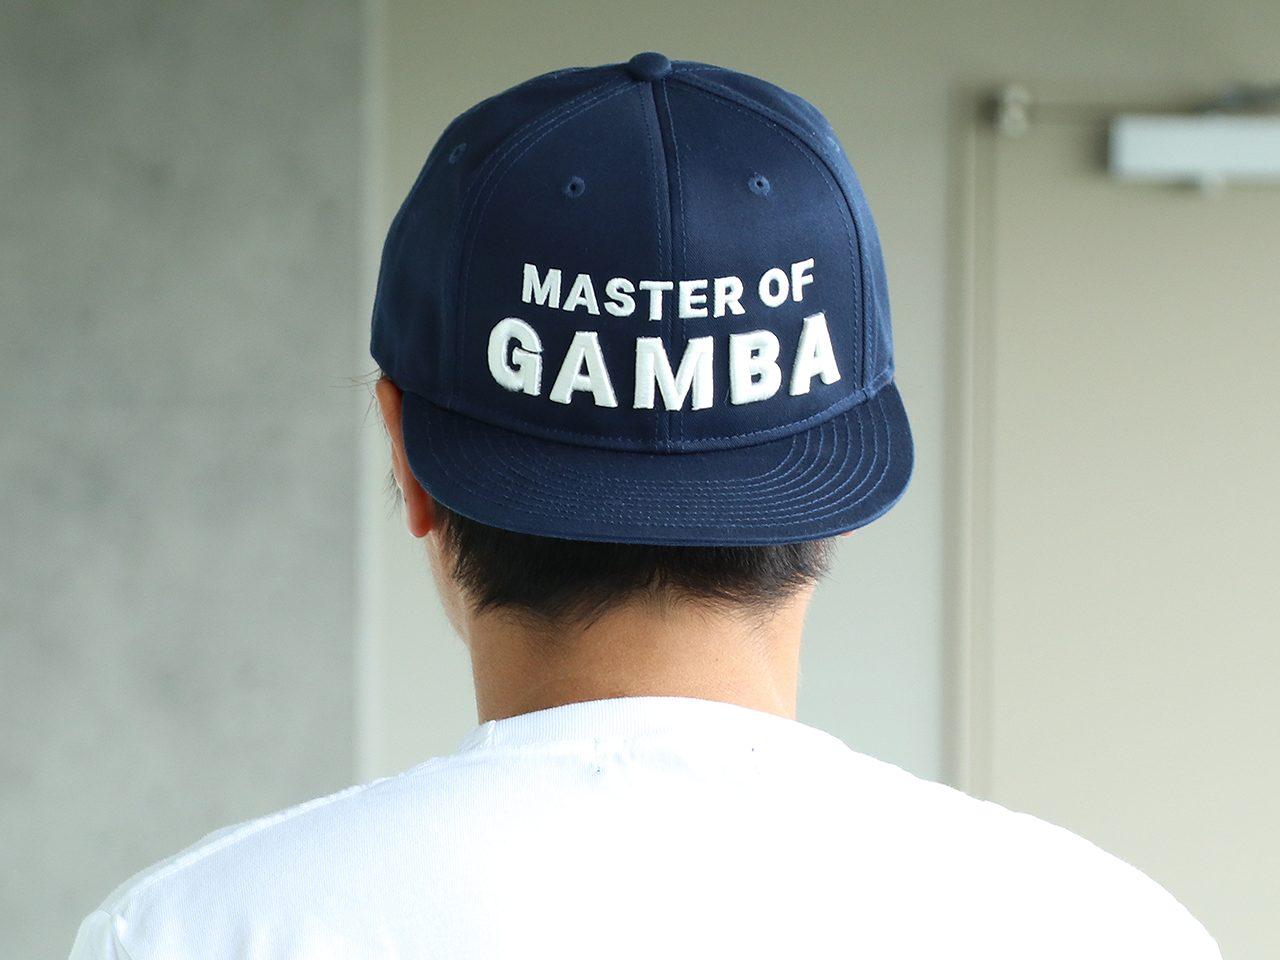 Master of GAMBA-SNAPBACK CAP